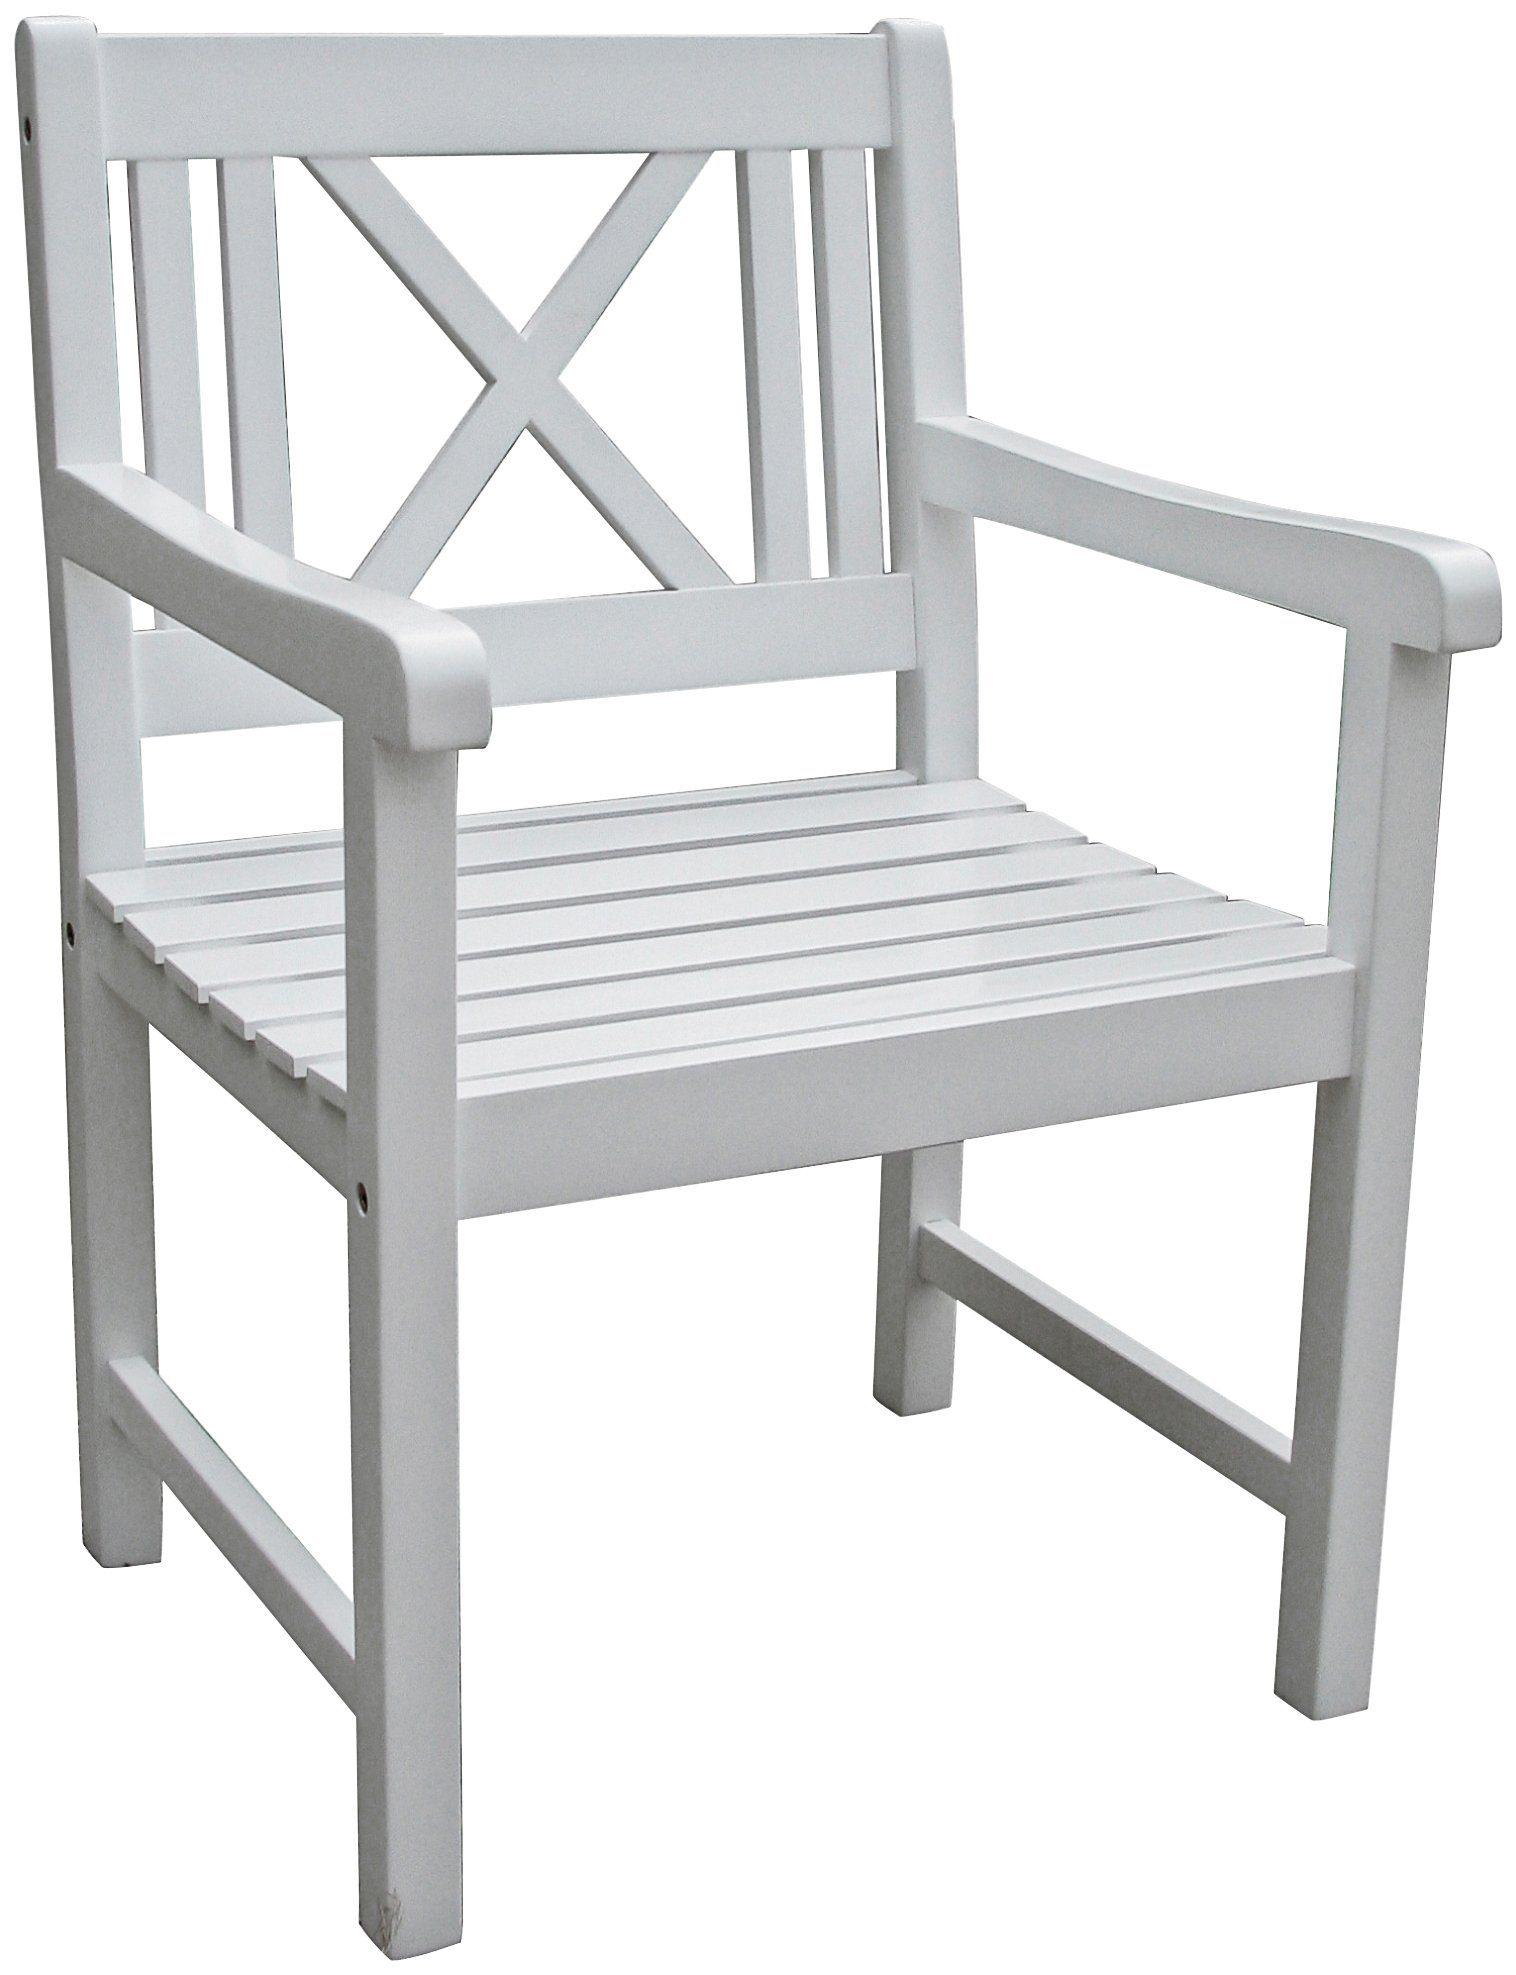 GARDEN PLEASURE Gartenstuhl »MALMÖ«, Eukalyptusholz, weiß